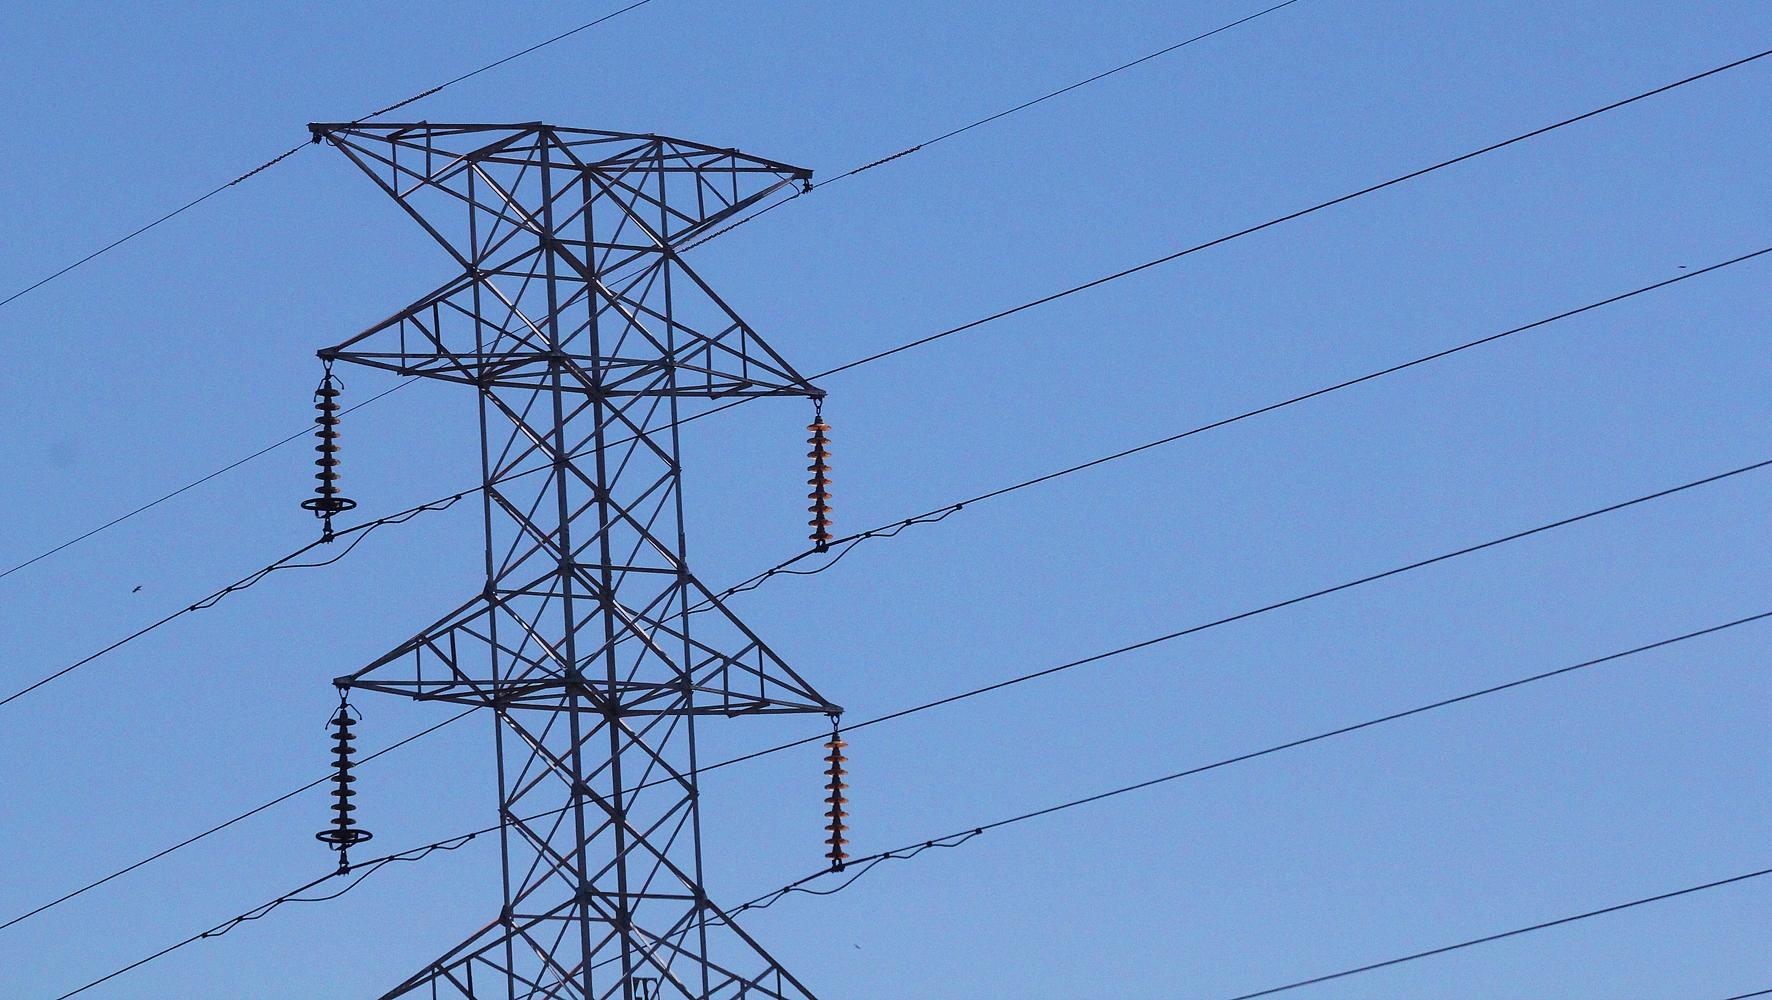 Risco de falta de energia diminui no Sudeste e Centro-Oeste